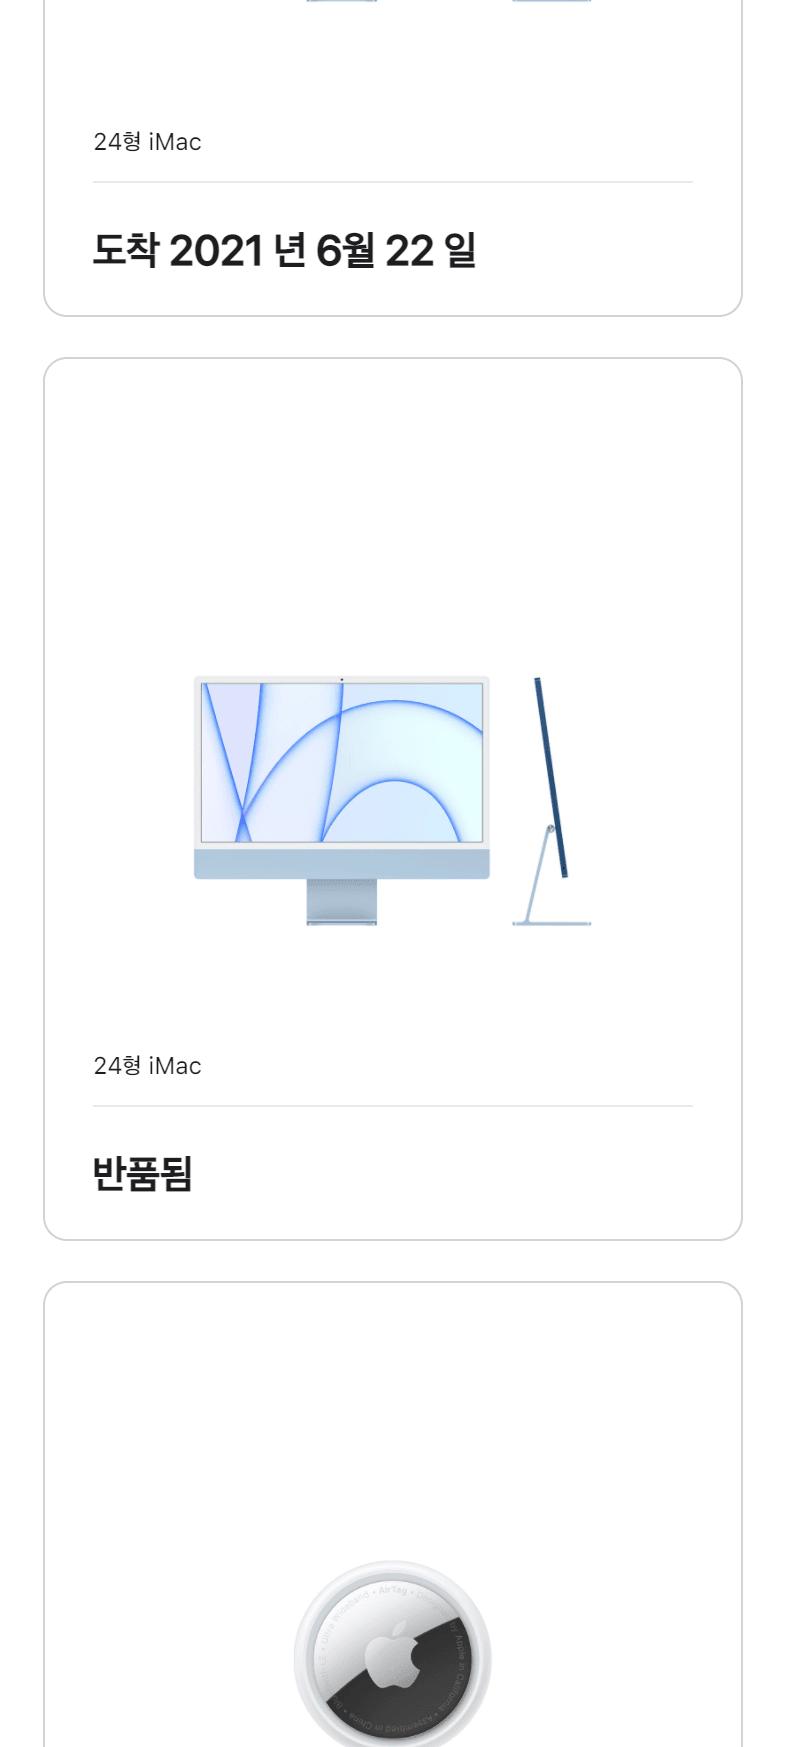 viewimage.php?id=24add122b4&no=24b0d769e1d32ca73cec8ffa11d0283137a147df66c0ff0e9ff48d5b5d7956dc239f9b15f972c3d65881d19f3602a5e1cb305597da081e81d009f475efdb2b862d